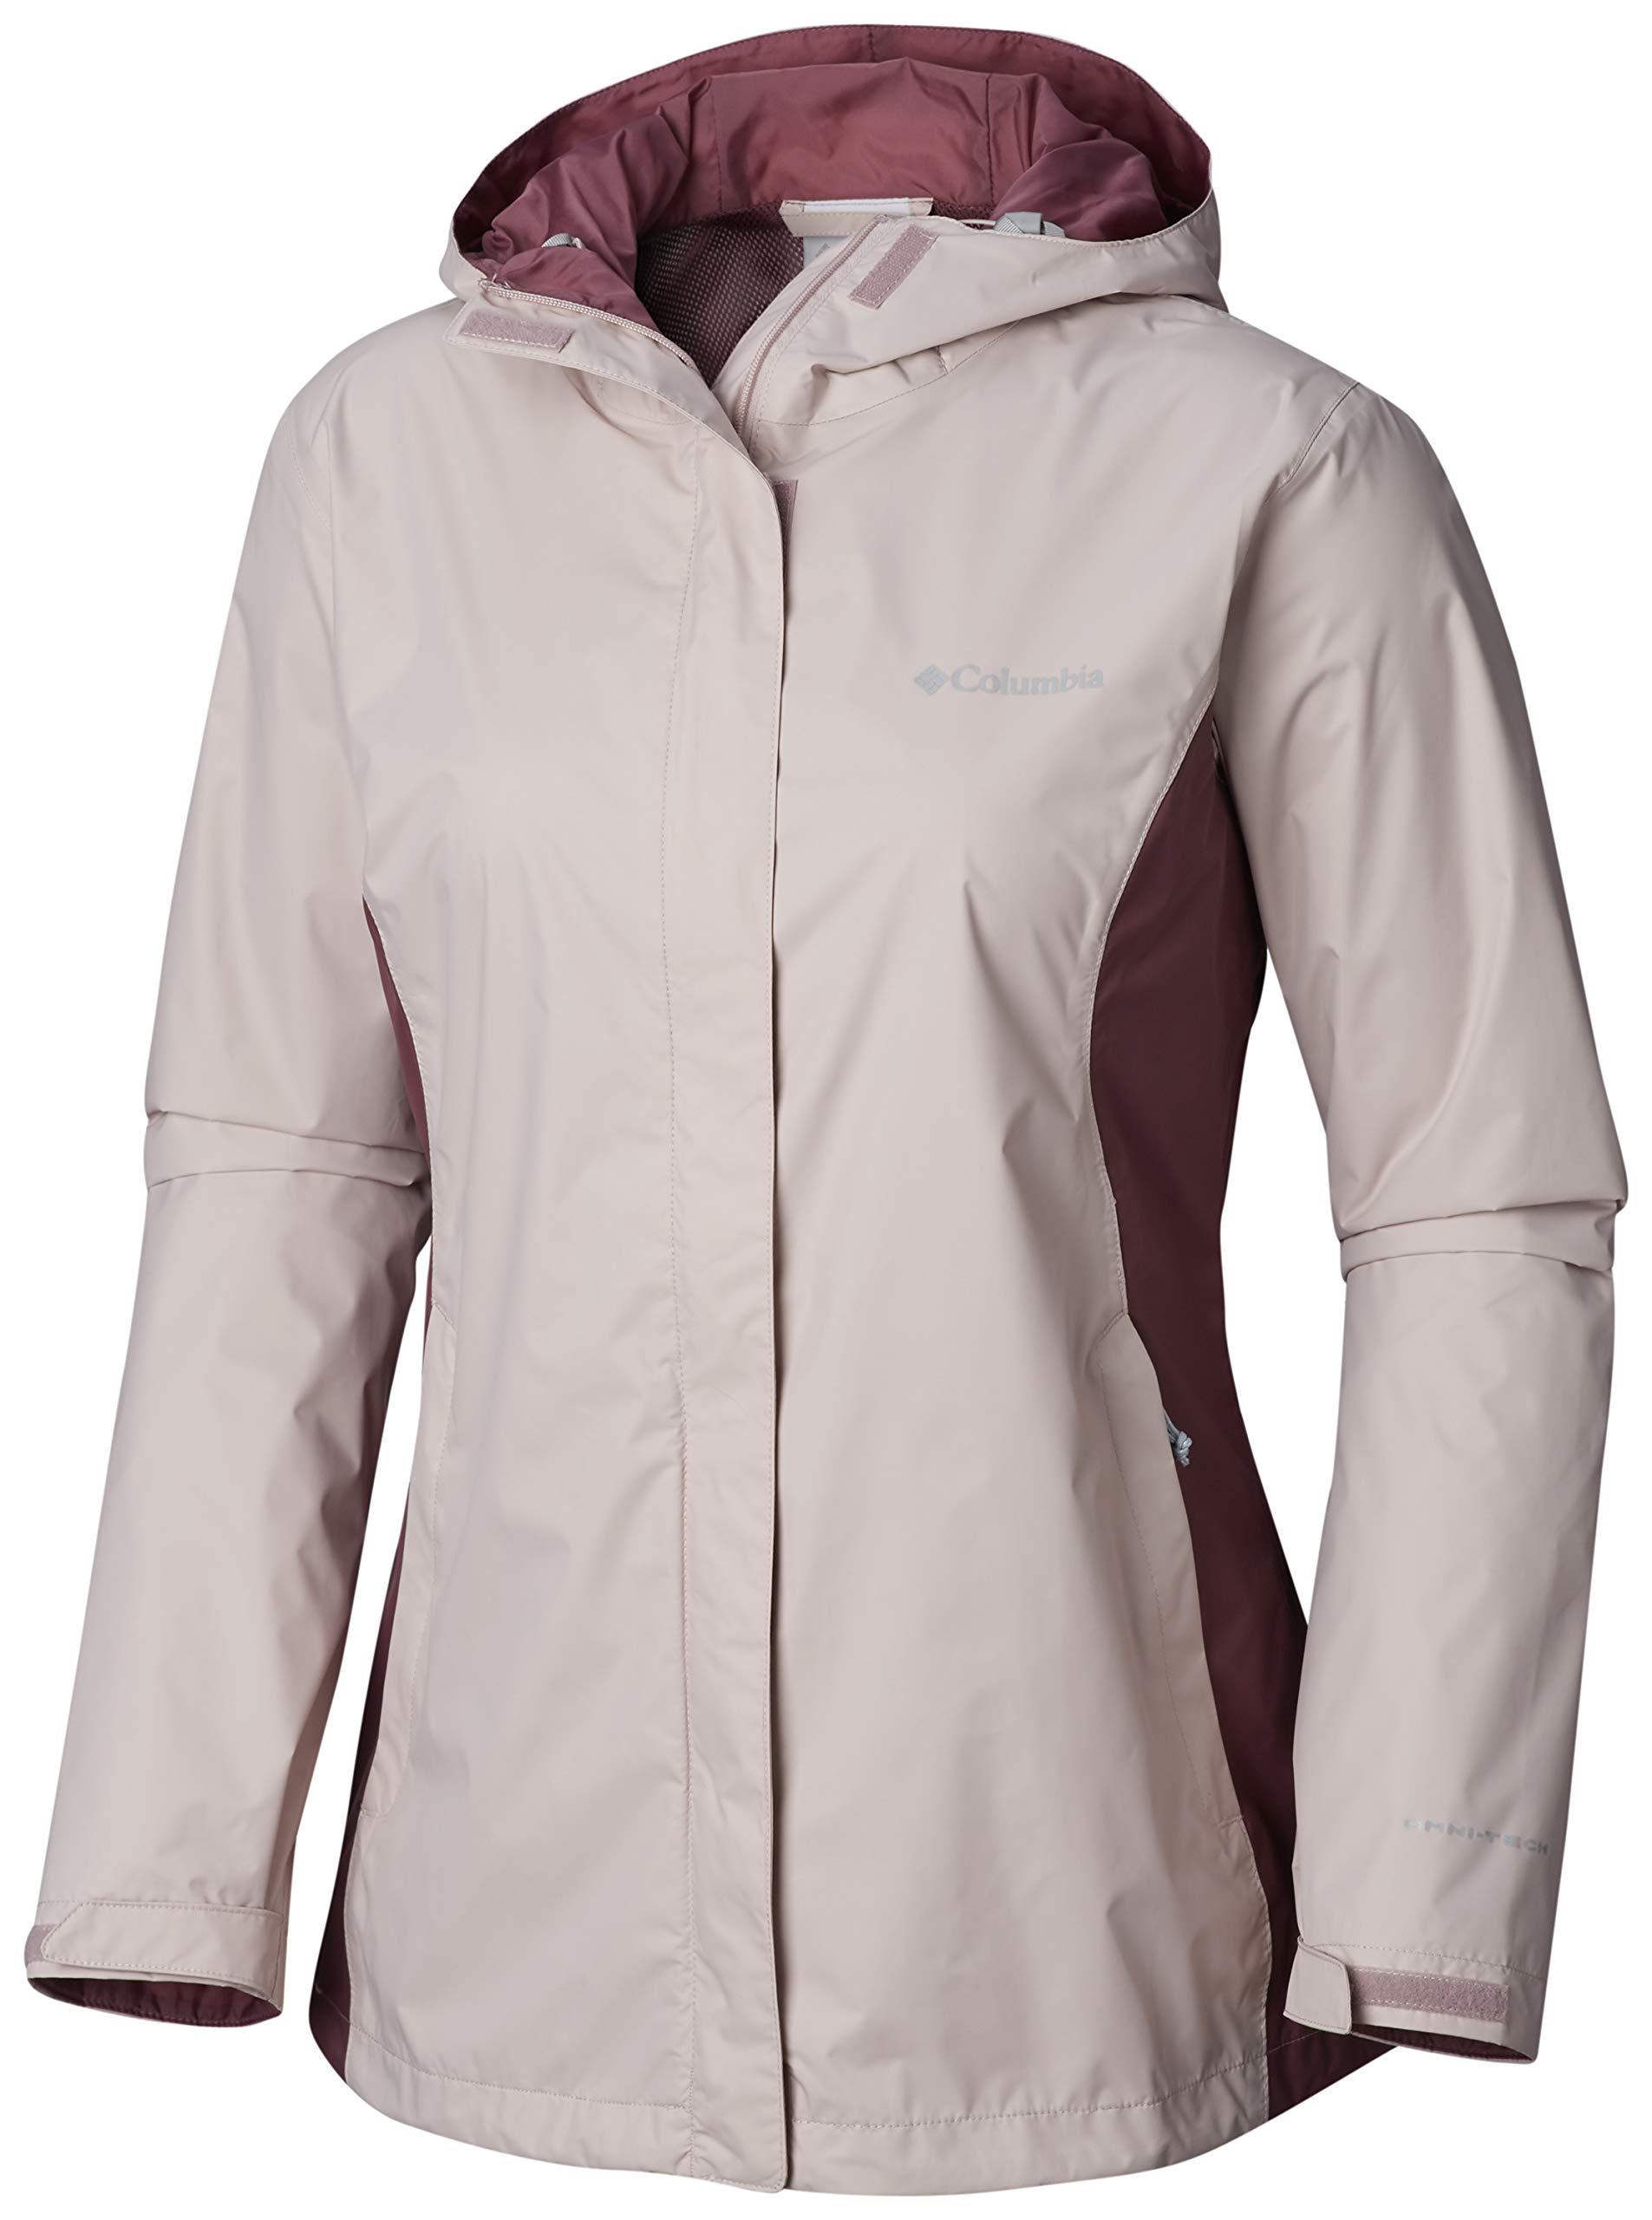 Columbia Women's Plus Size Arcadia II Jacket, Mineral Pink/Antique Mauve X-Large